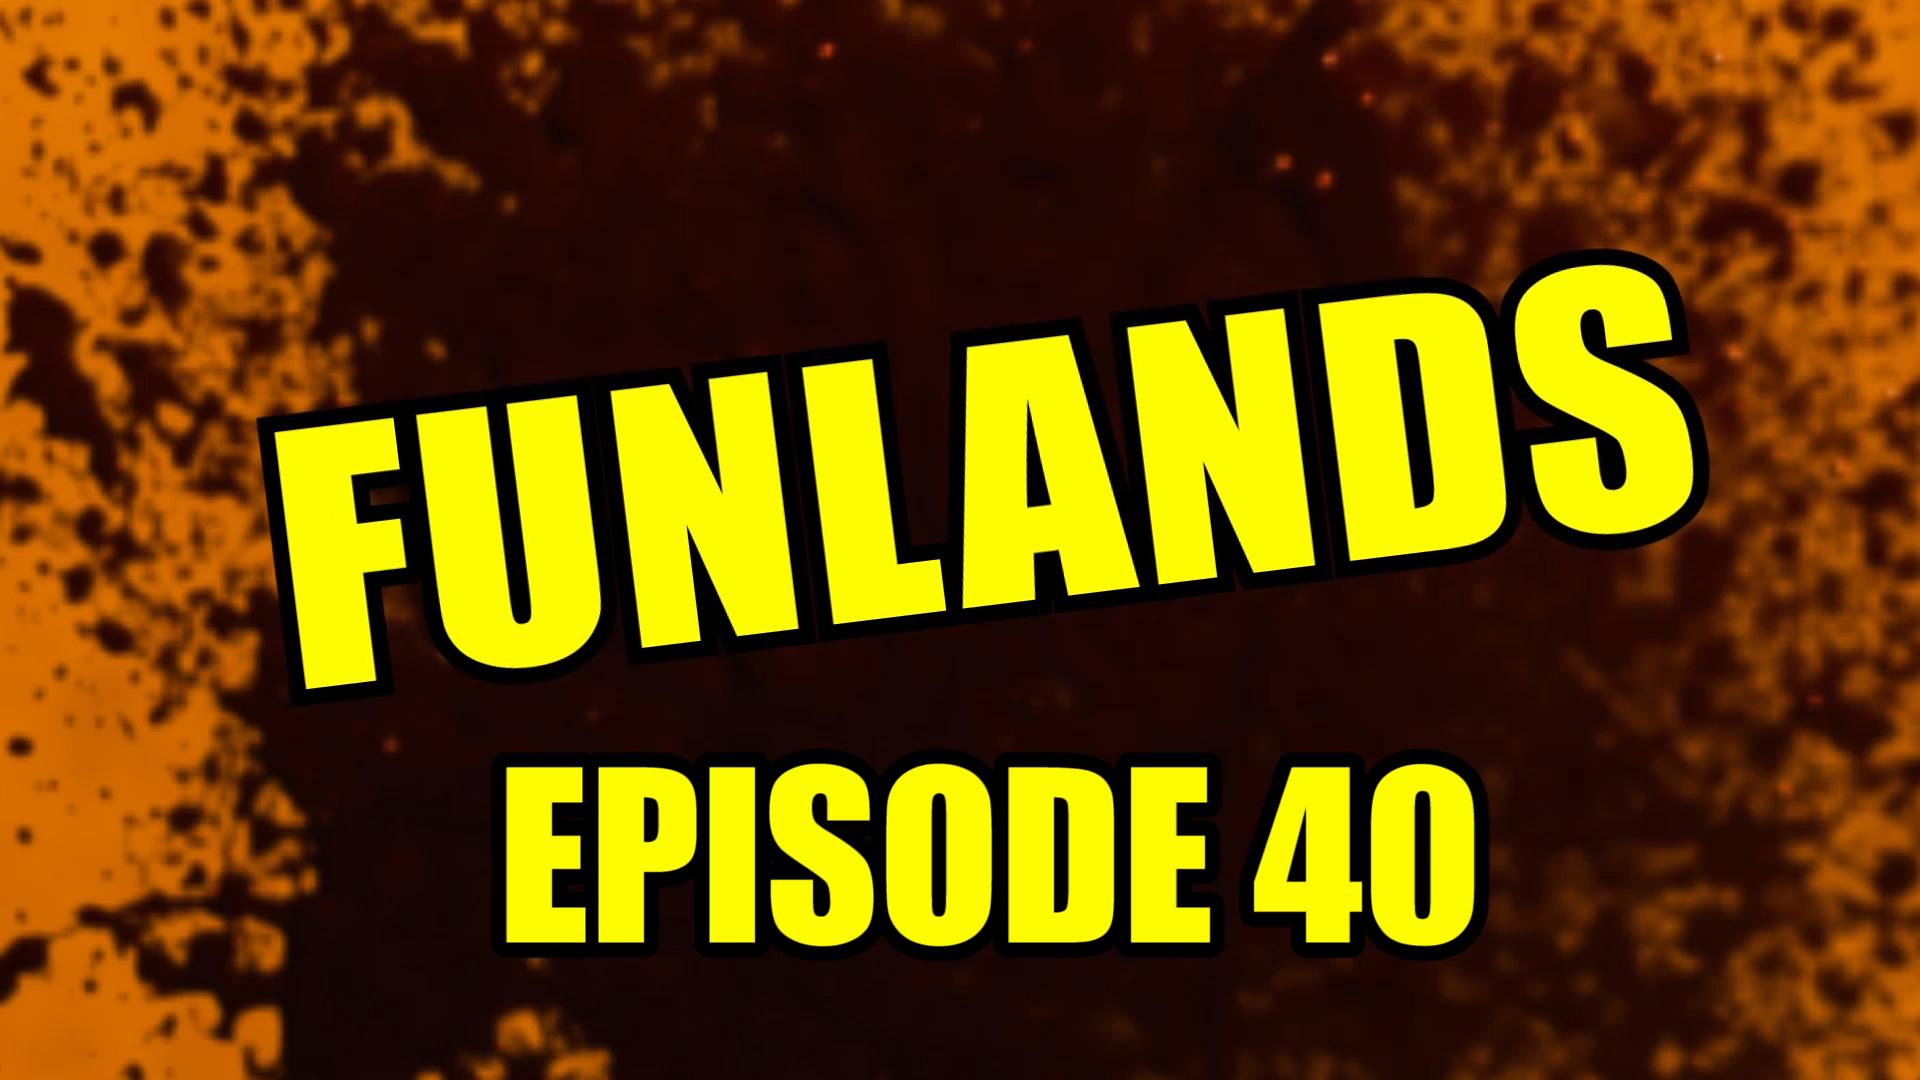 Funlands Episode 40.jpg